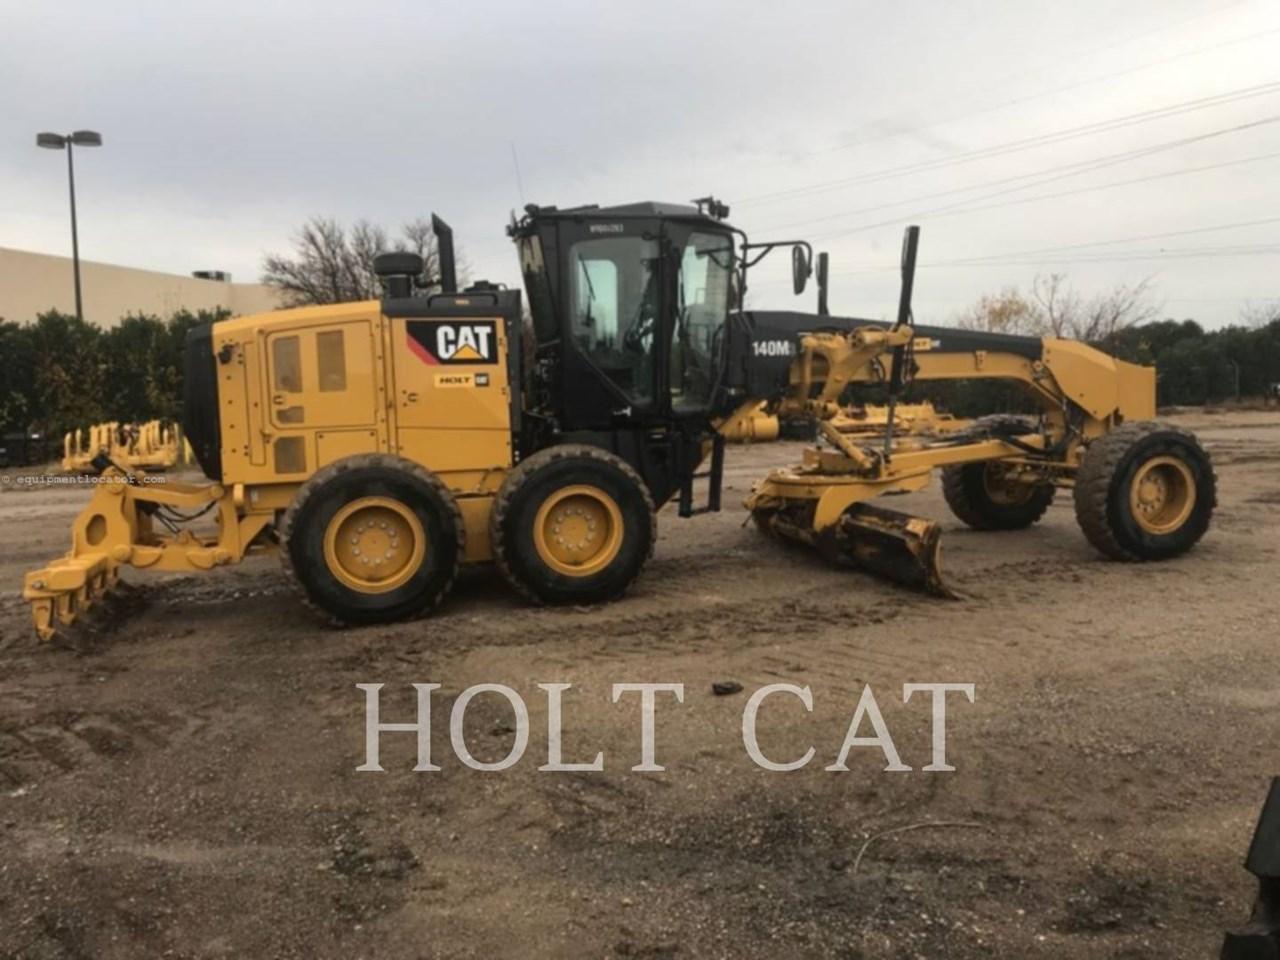 2019 Caterpillar 140M3 Image 1